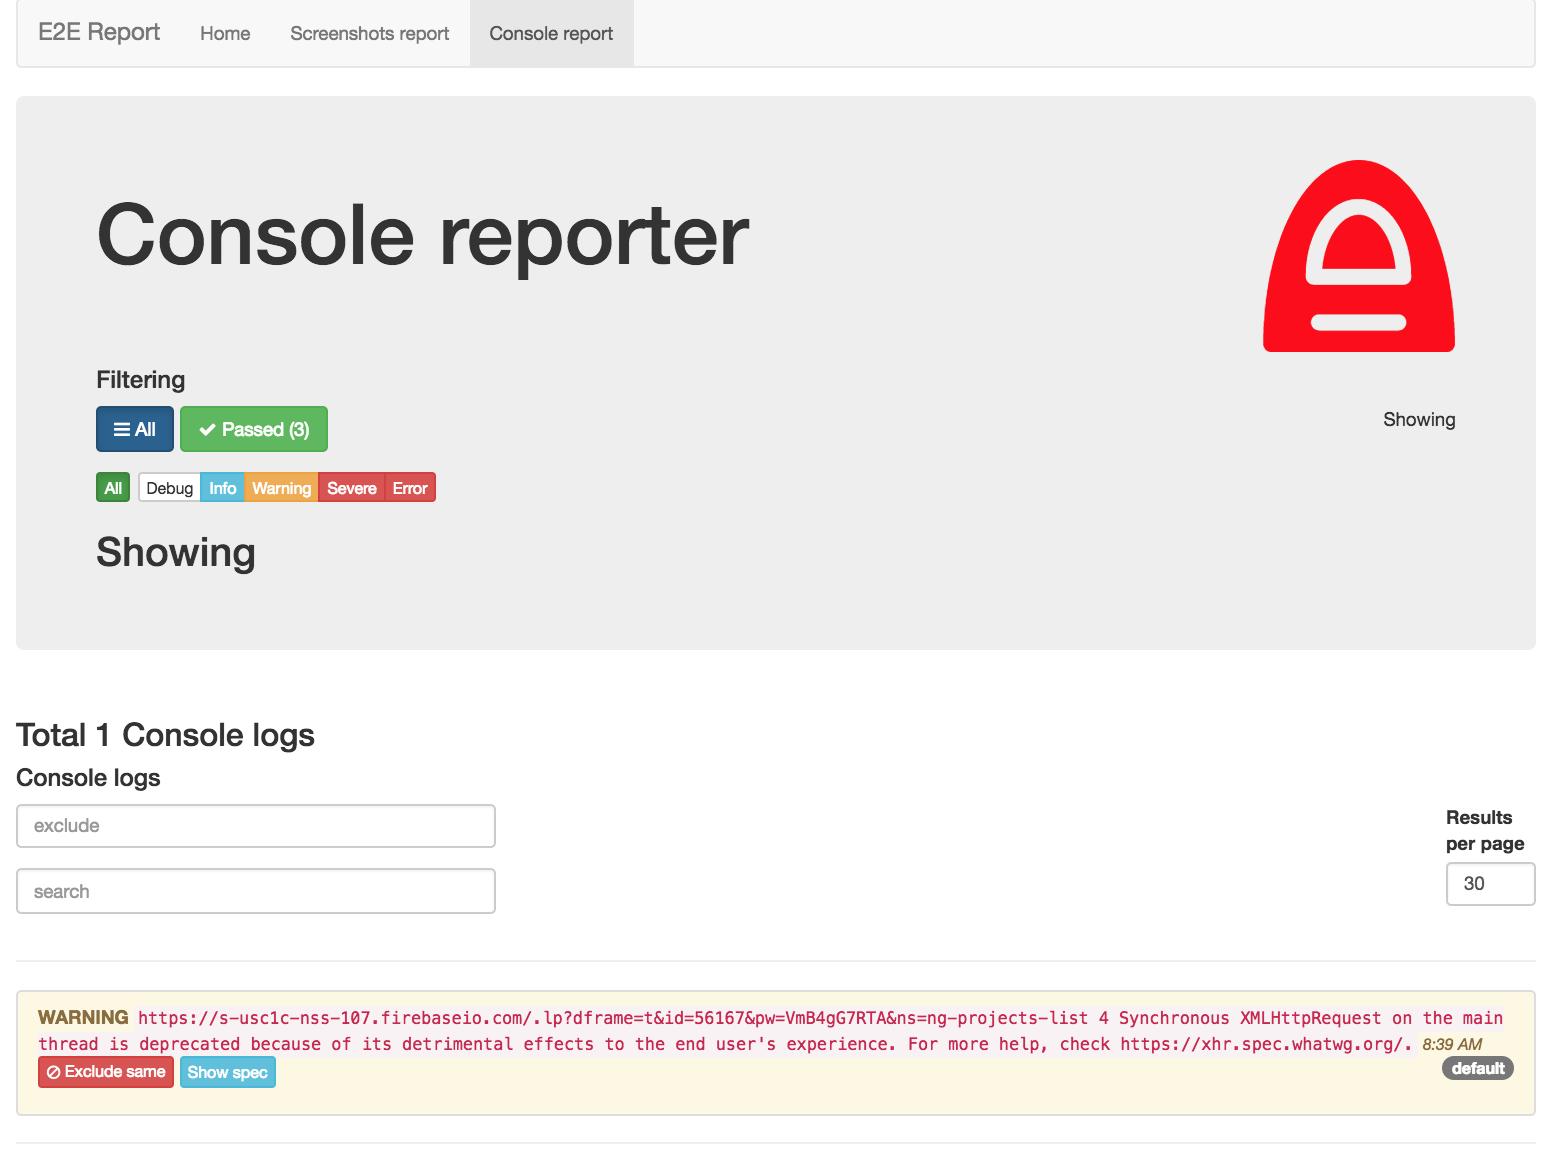 Screenshoter reporter console